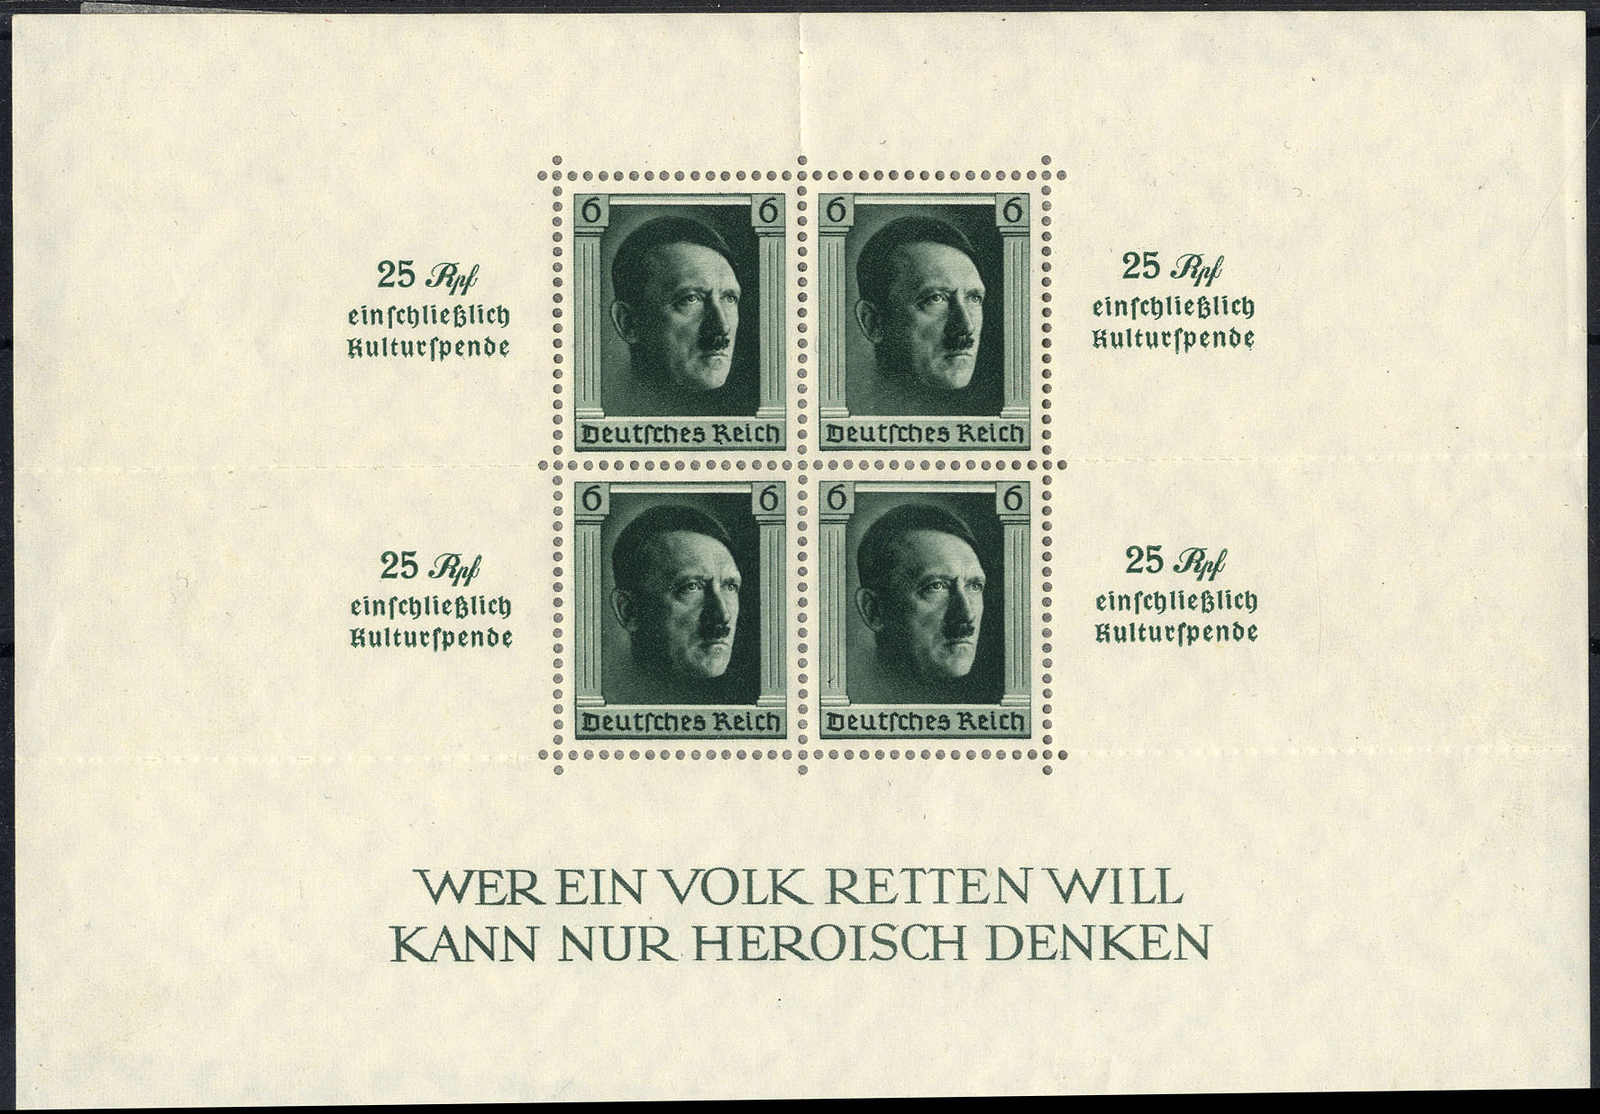 Lot 3736 - germany German Empire -  Viennafil Auktionen 63rd LIVE AUCTION